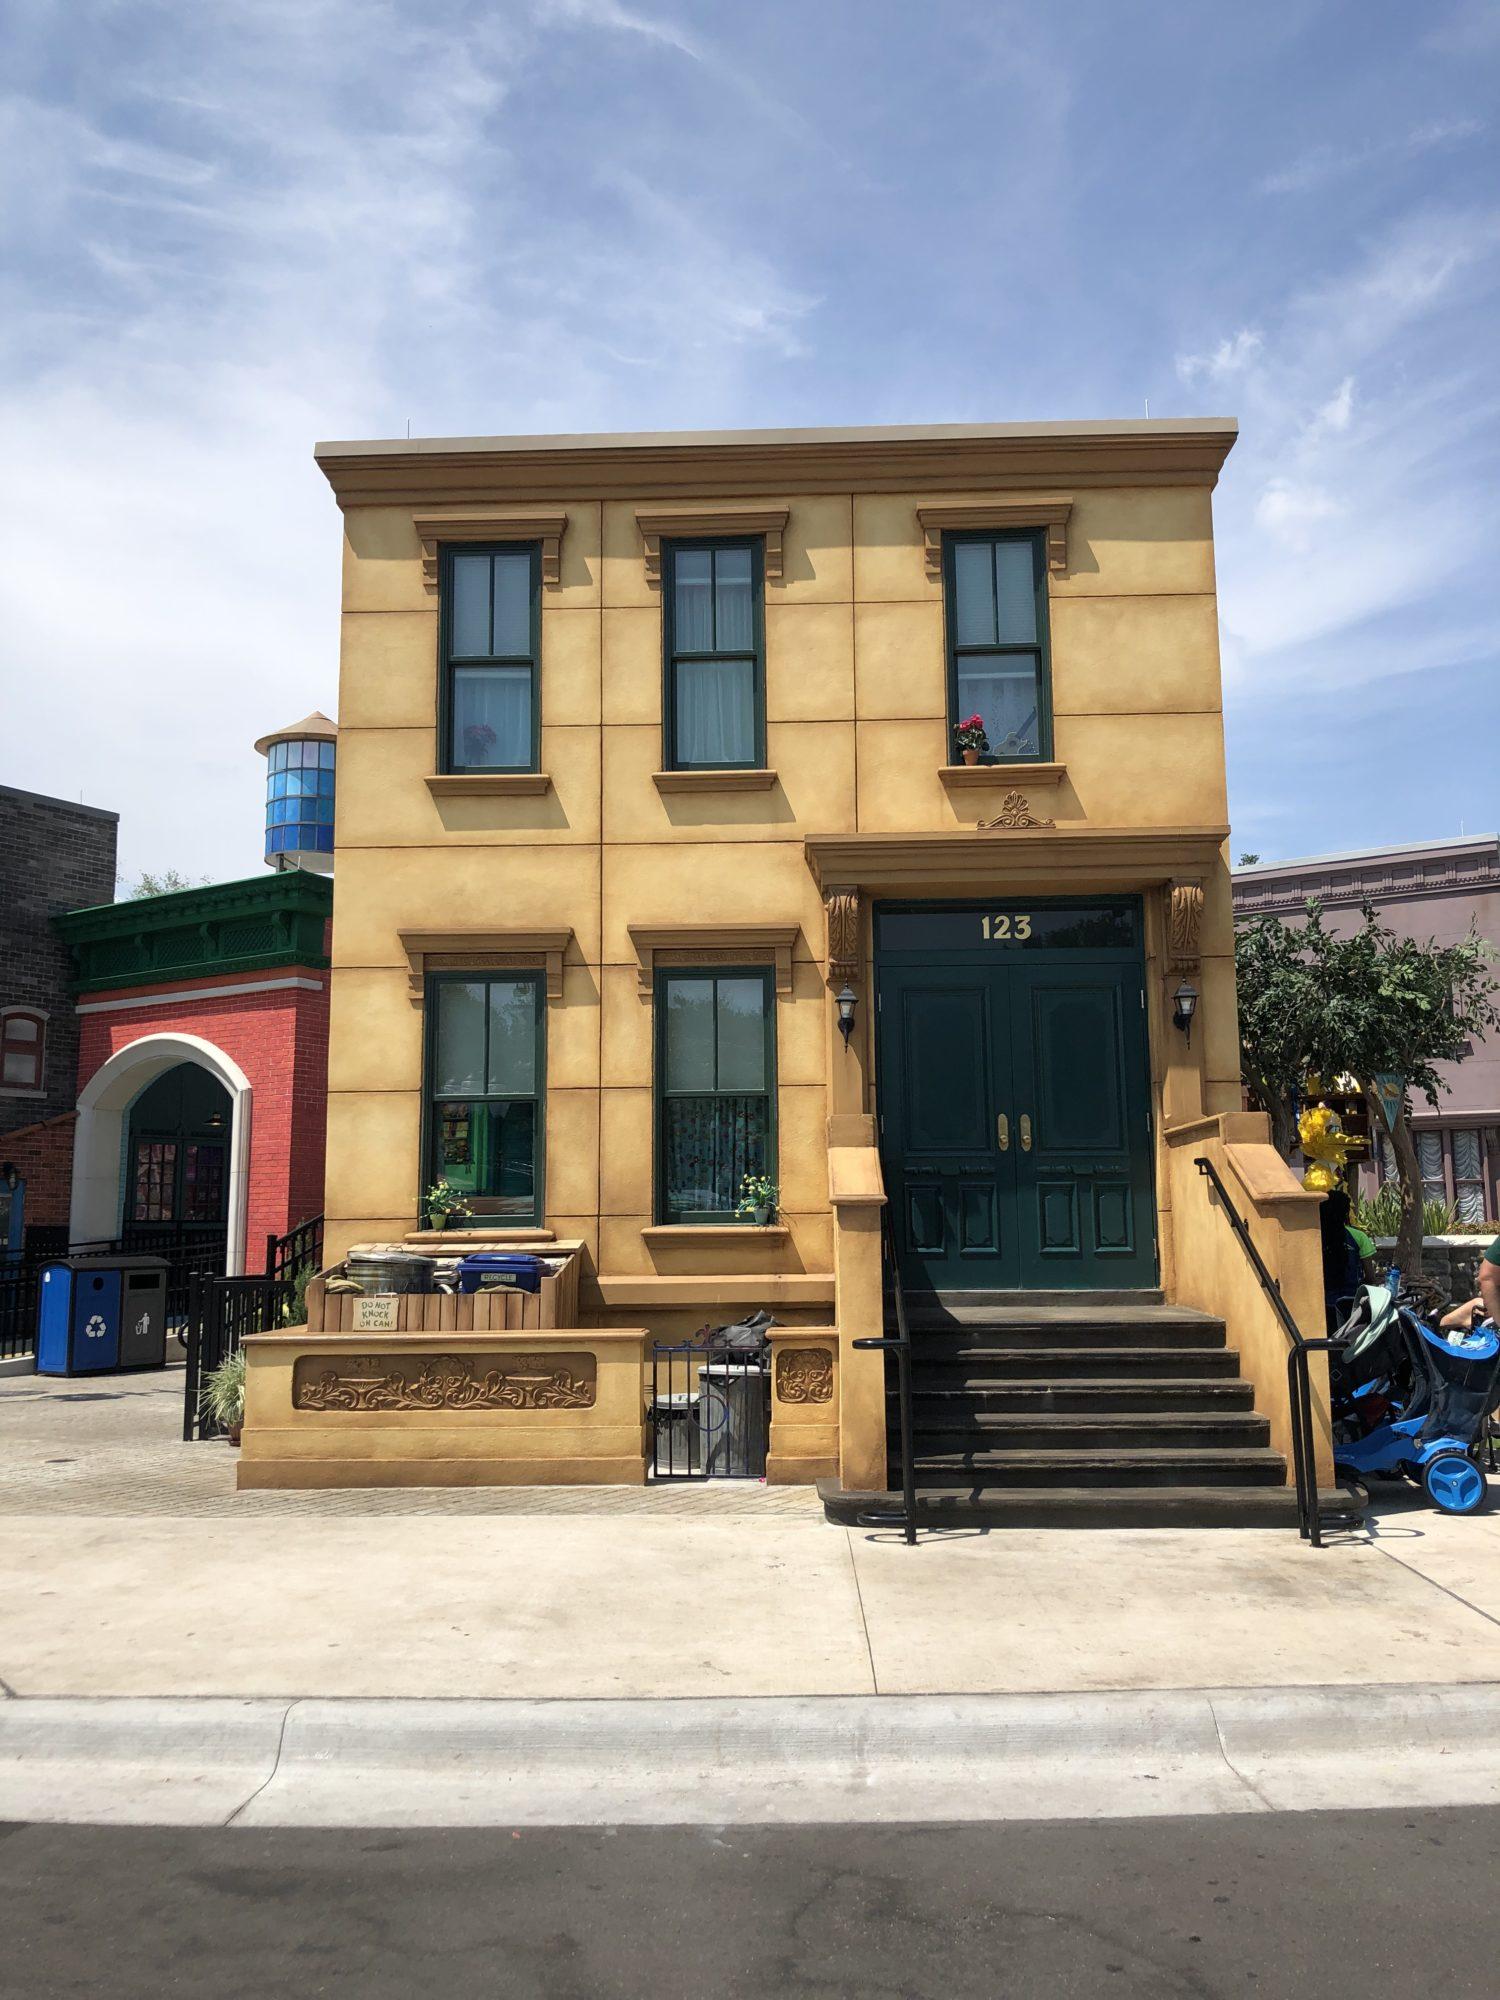 Mr. Hooper's Store SeaWorld Orlando